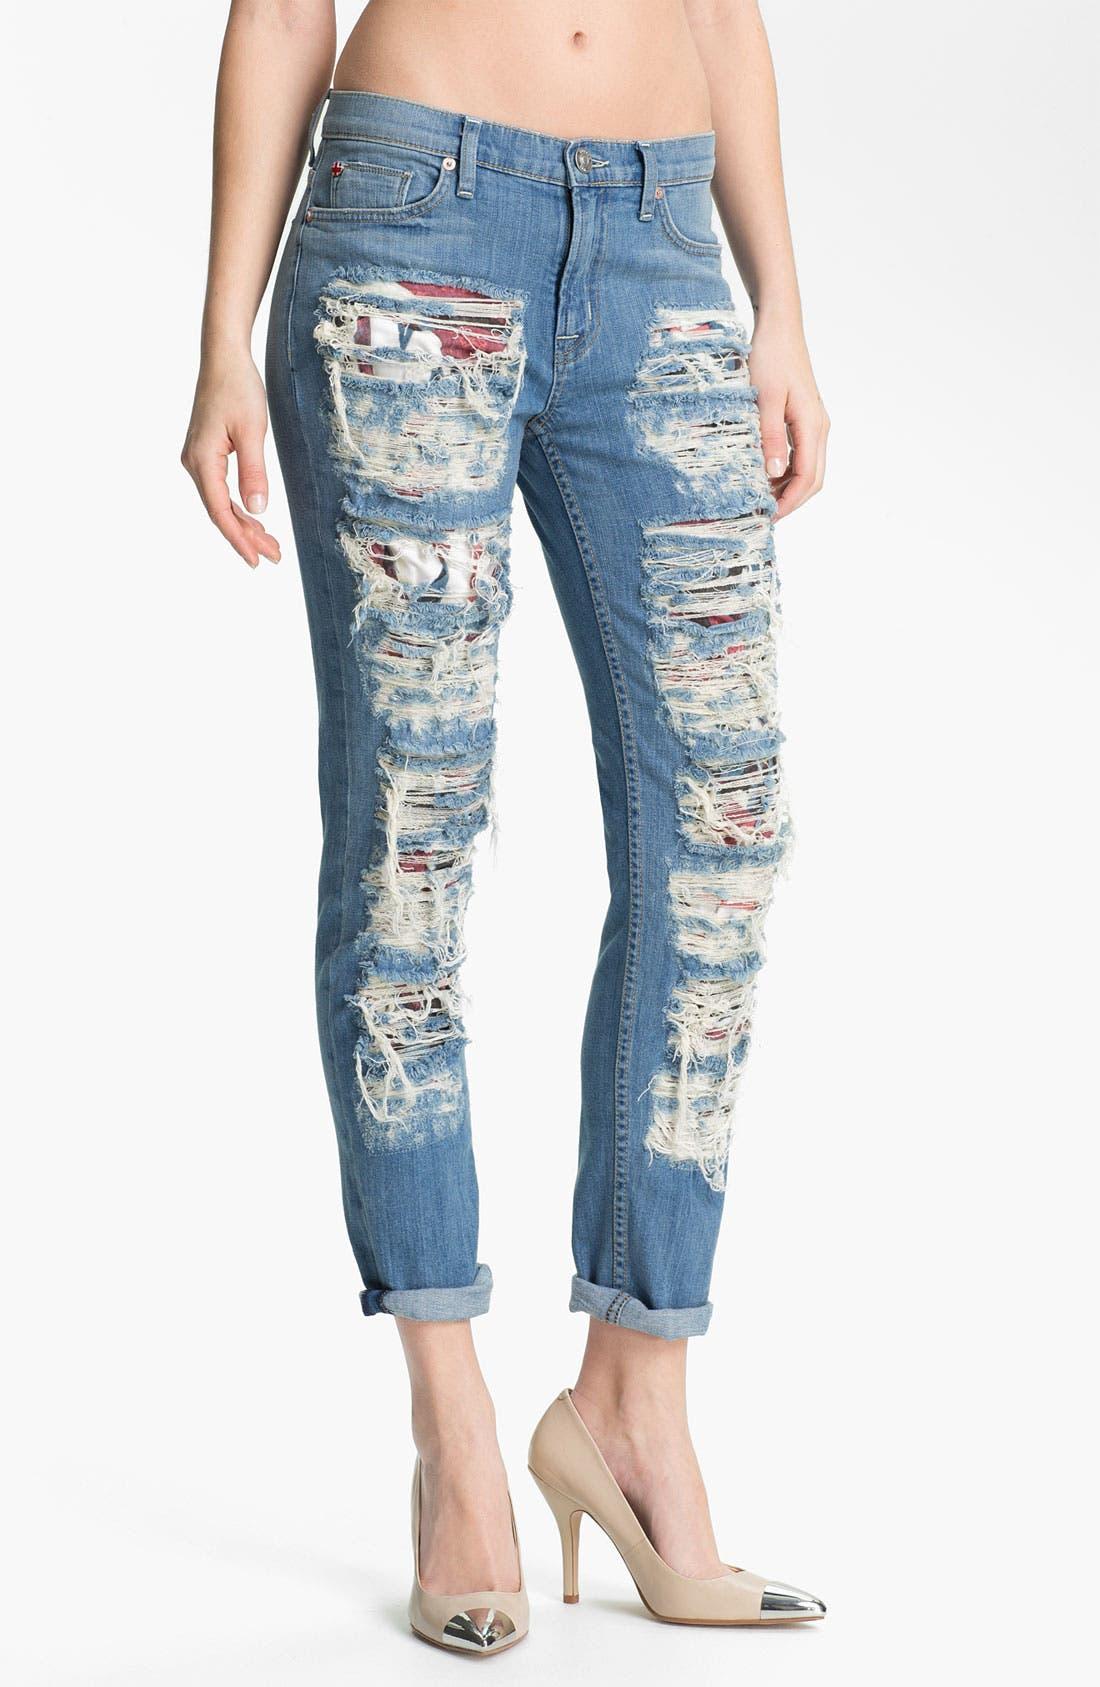 Main Image - Hudson Jeans 'Courtney' Slashed Straight Leg Jeans (Anti-Establishment)